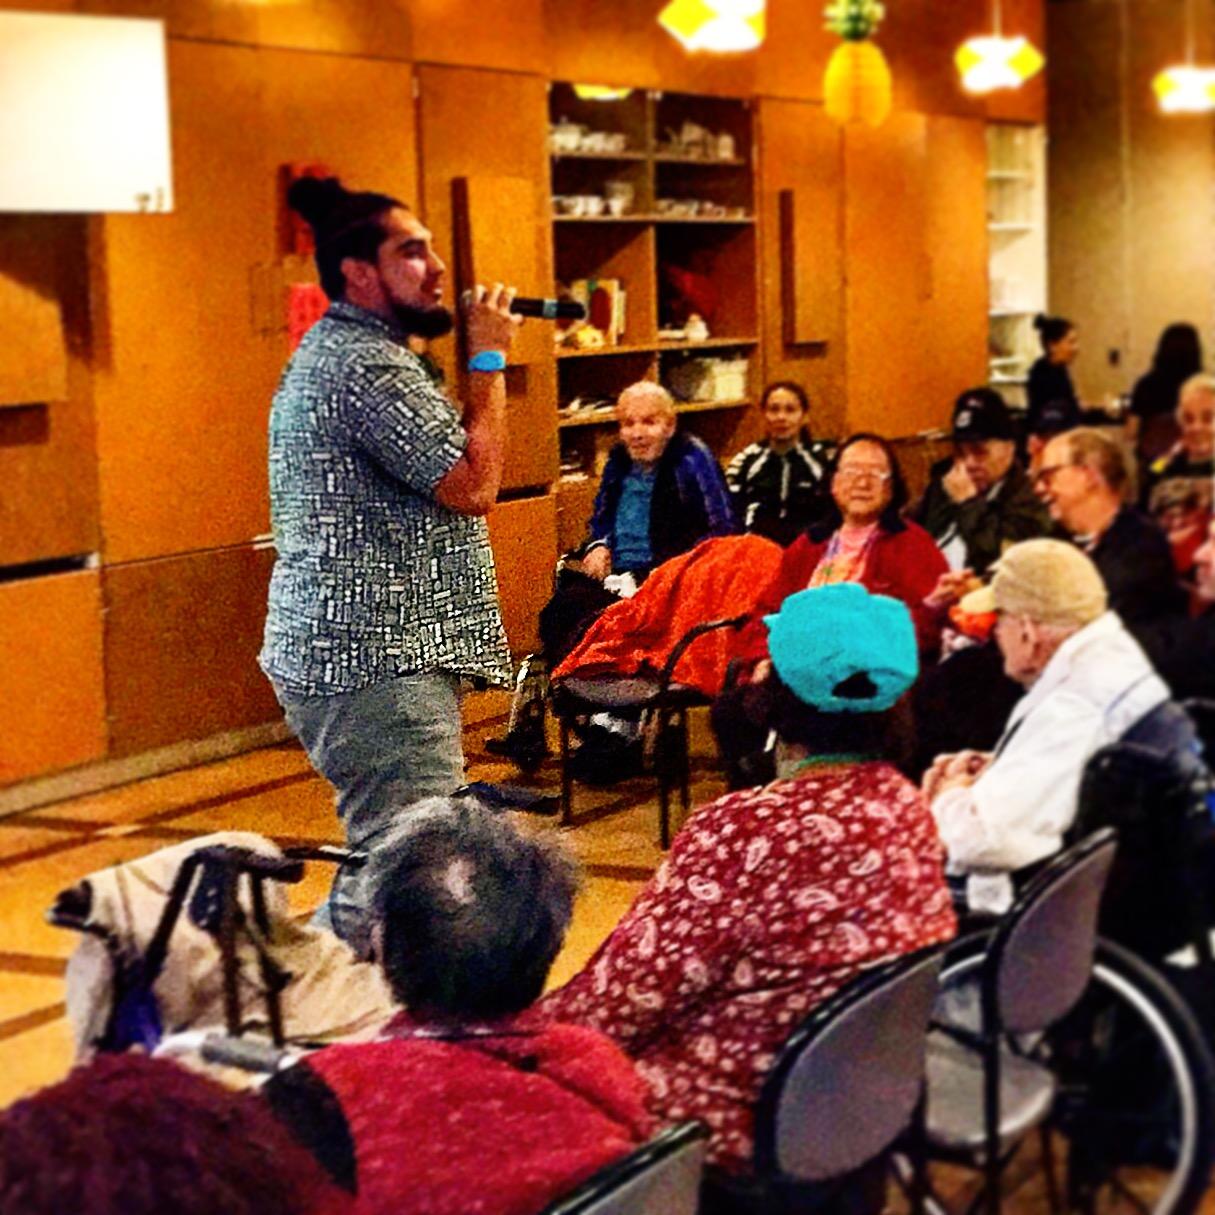 Spoken word artist Brandon Santiago